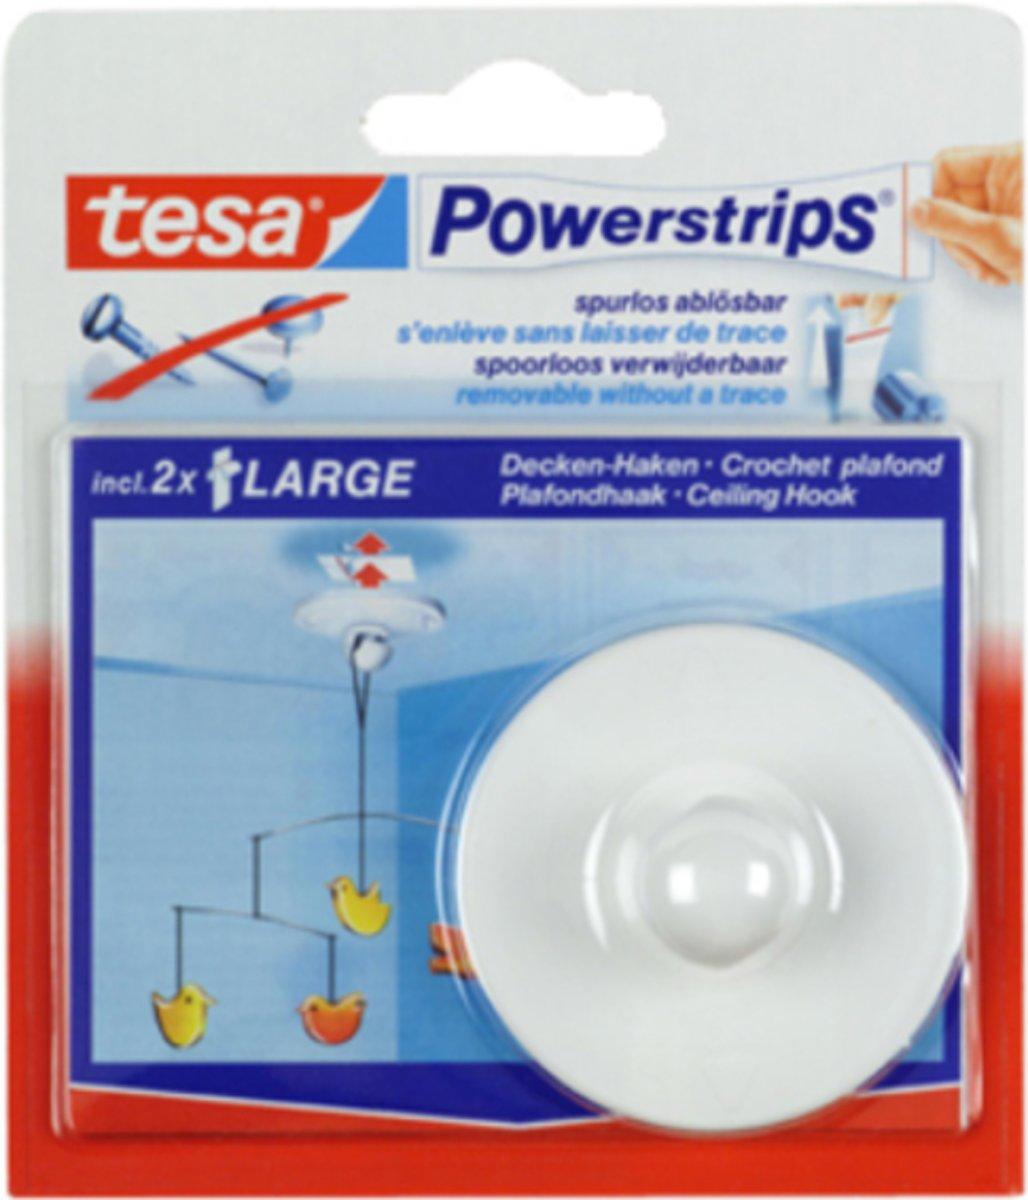 Bolcom Tesa 58029 Powerstrips Plafondhaak Wit